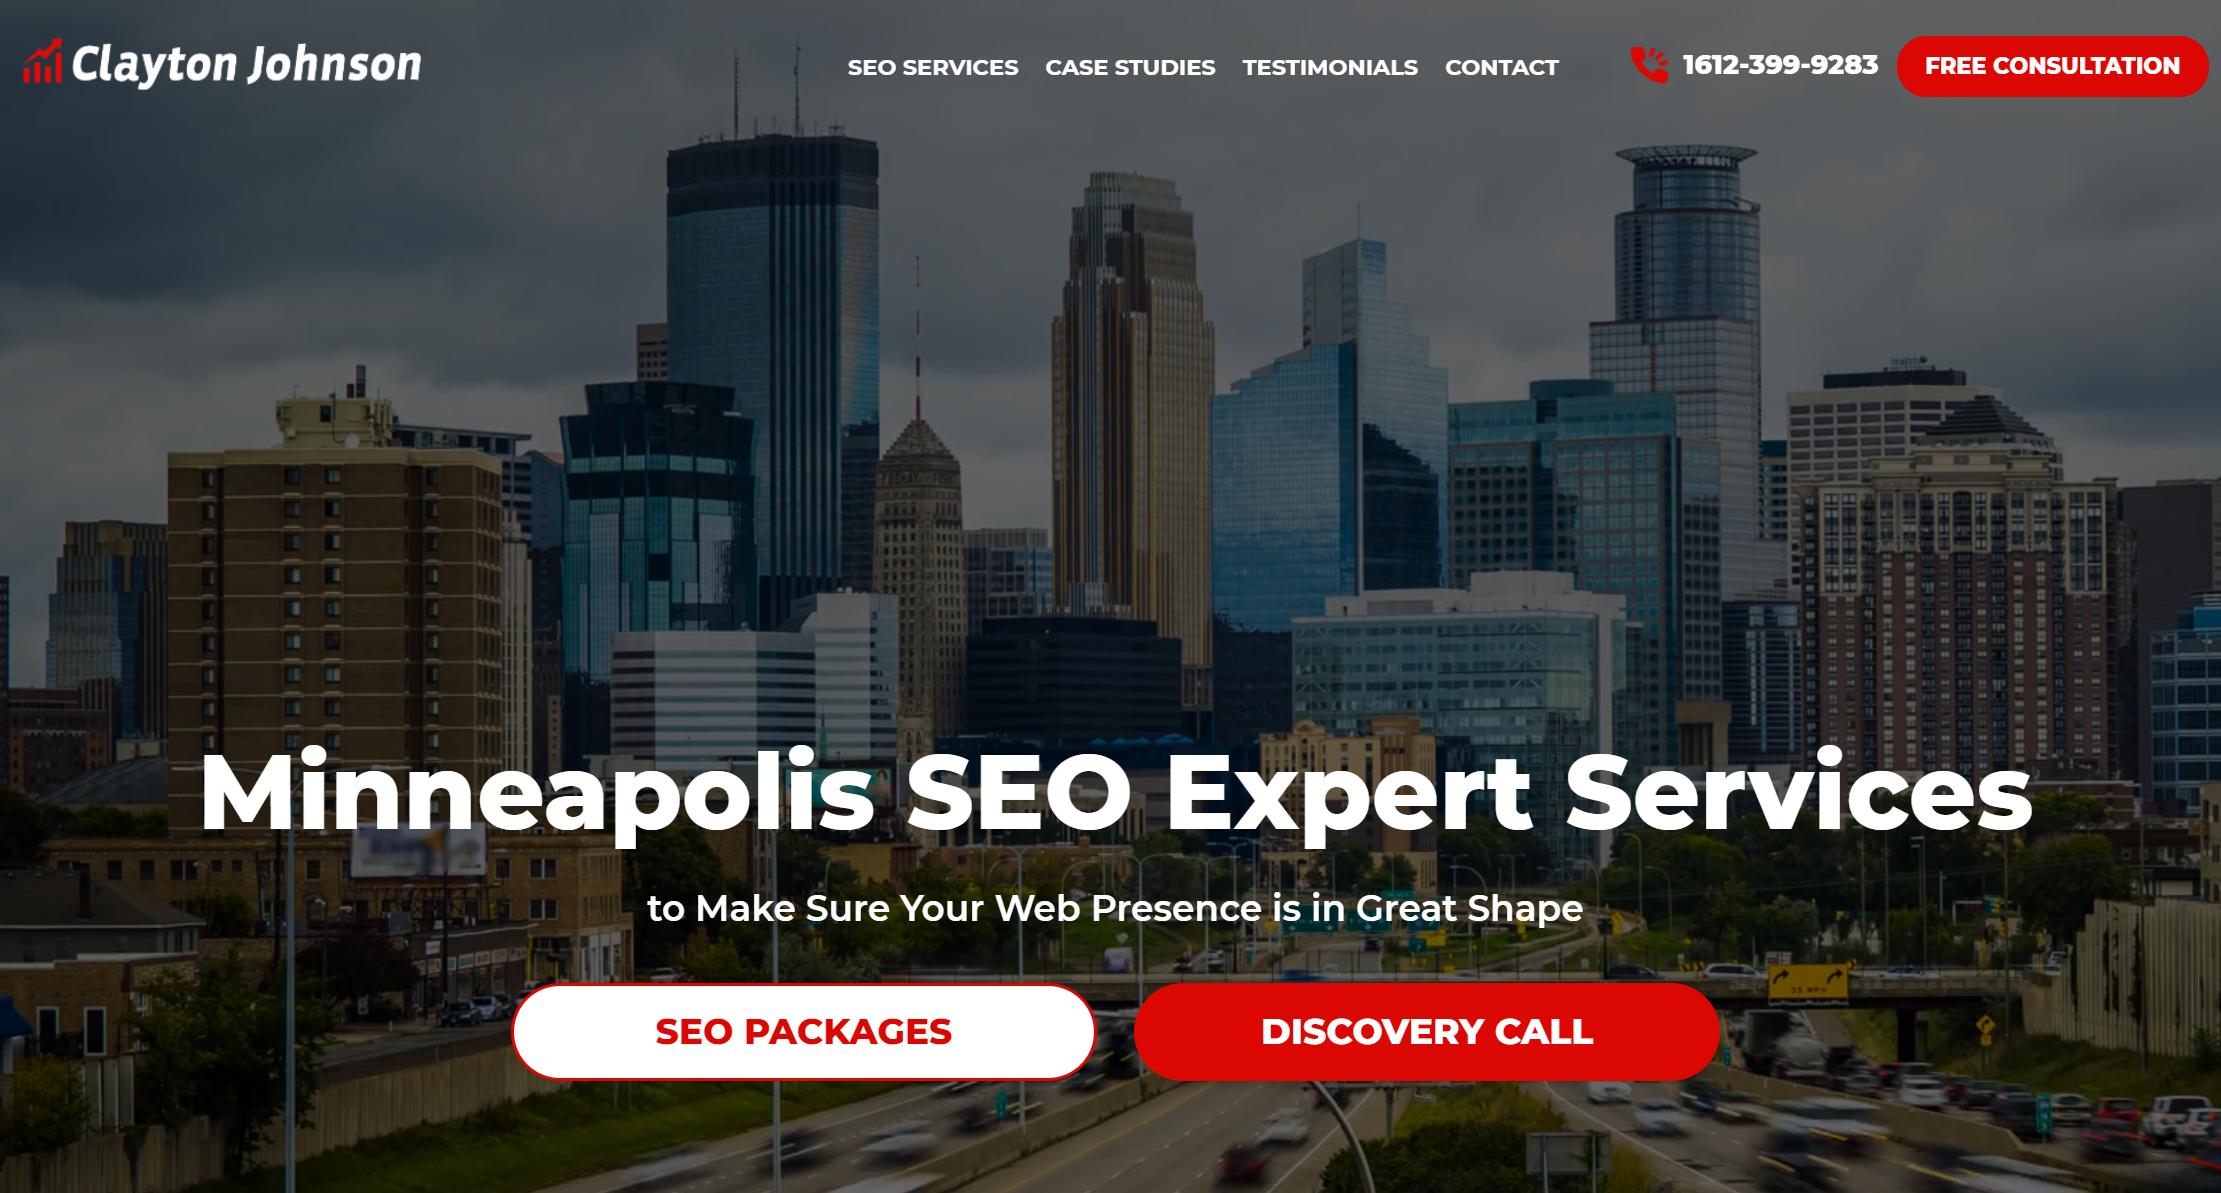 Marketing consultant website - example 2